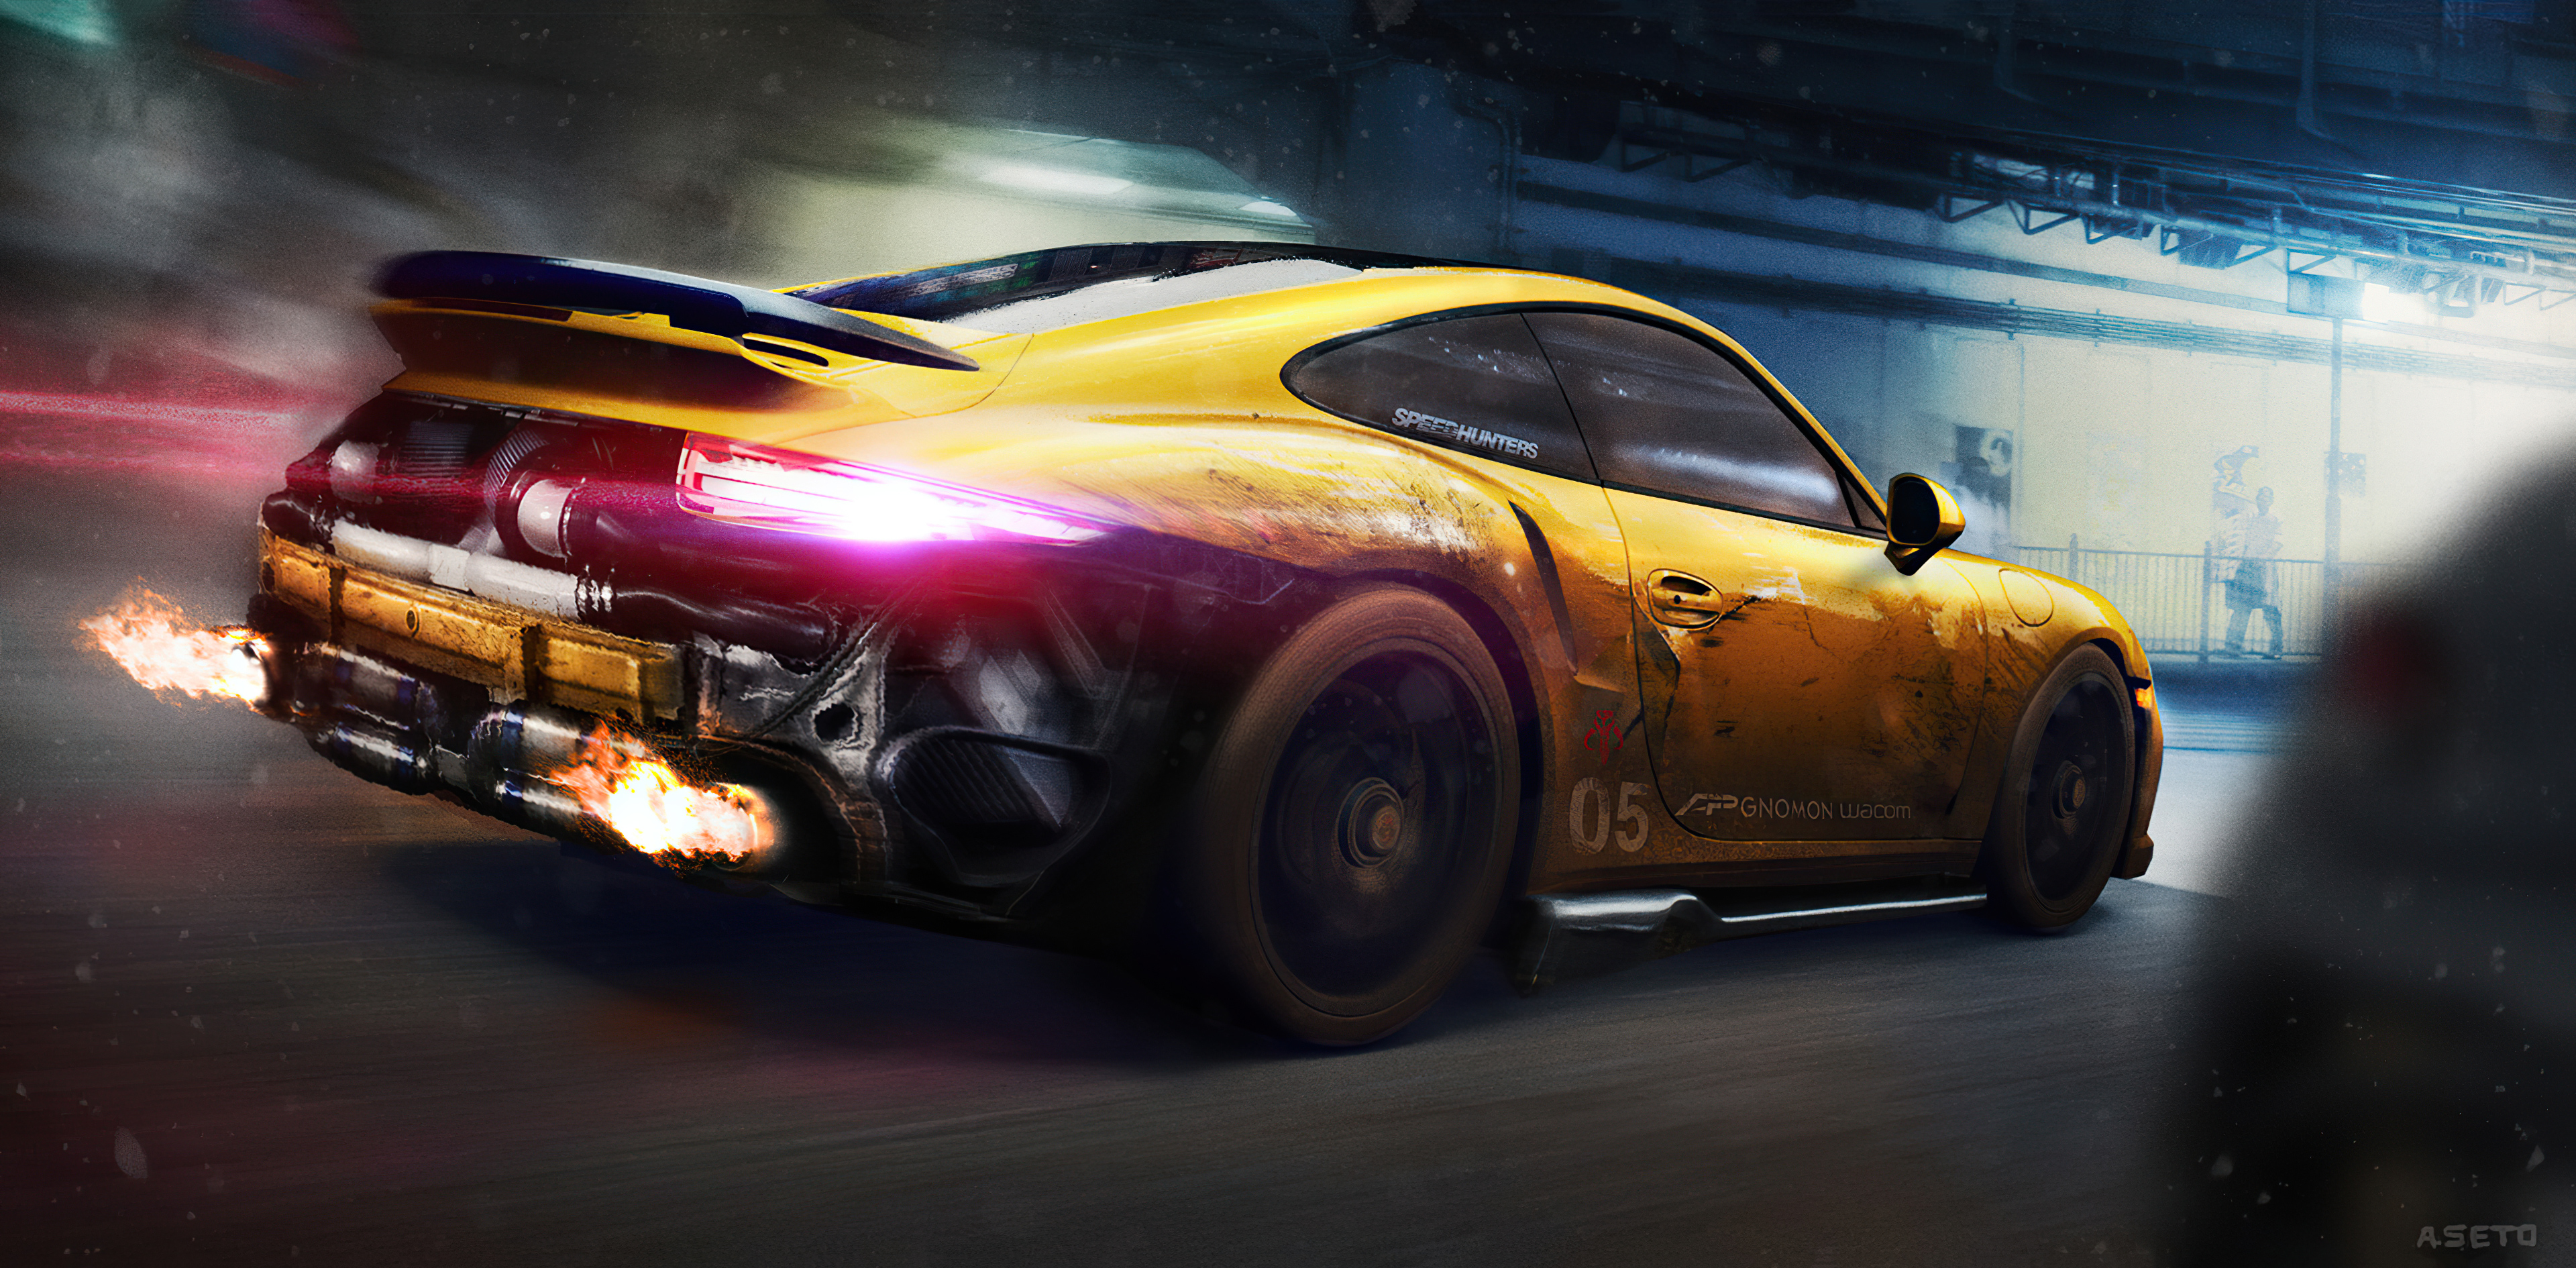 porsche 911 turbo s night ride 4k 1608916285 - Porsche 911 Turbo S Night Ride 4k - Porsche 911 Turbo S Night Ride 4k wallpapers